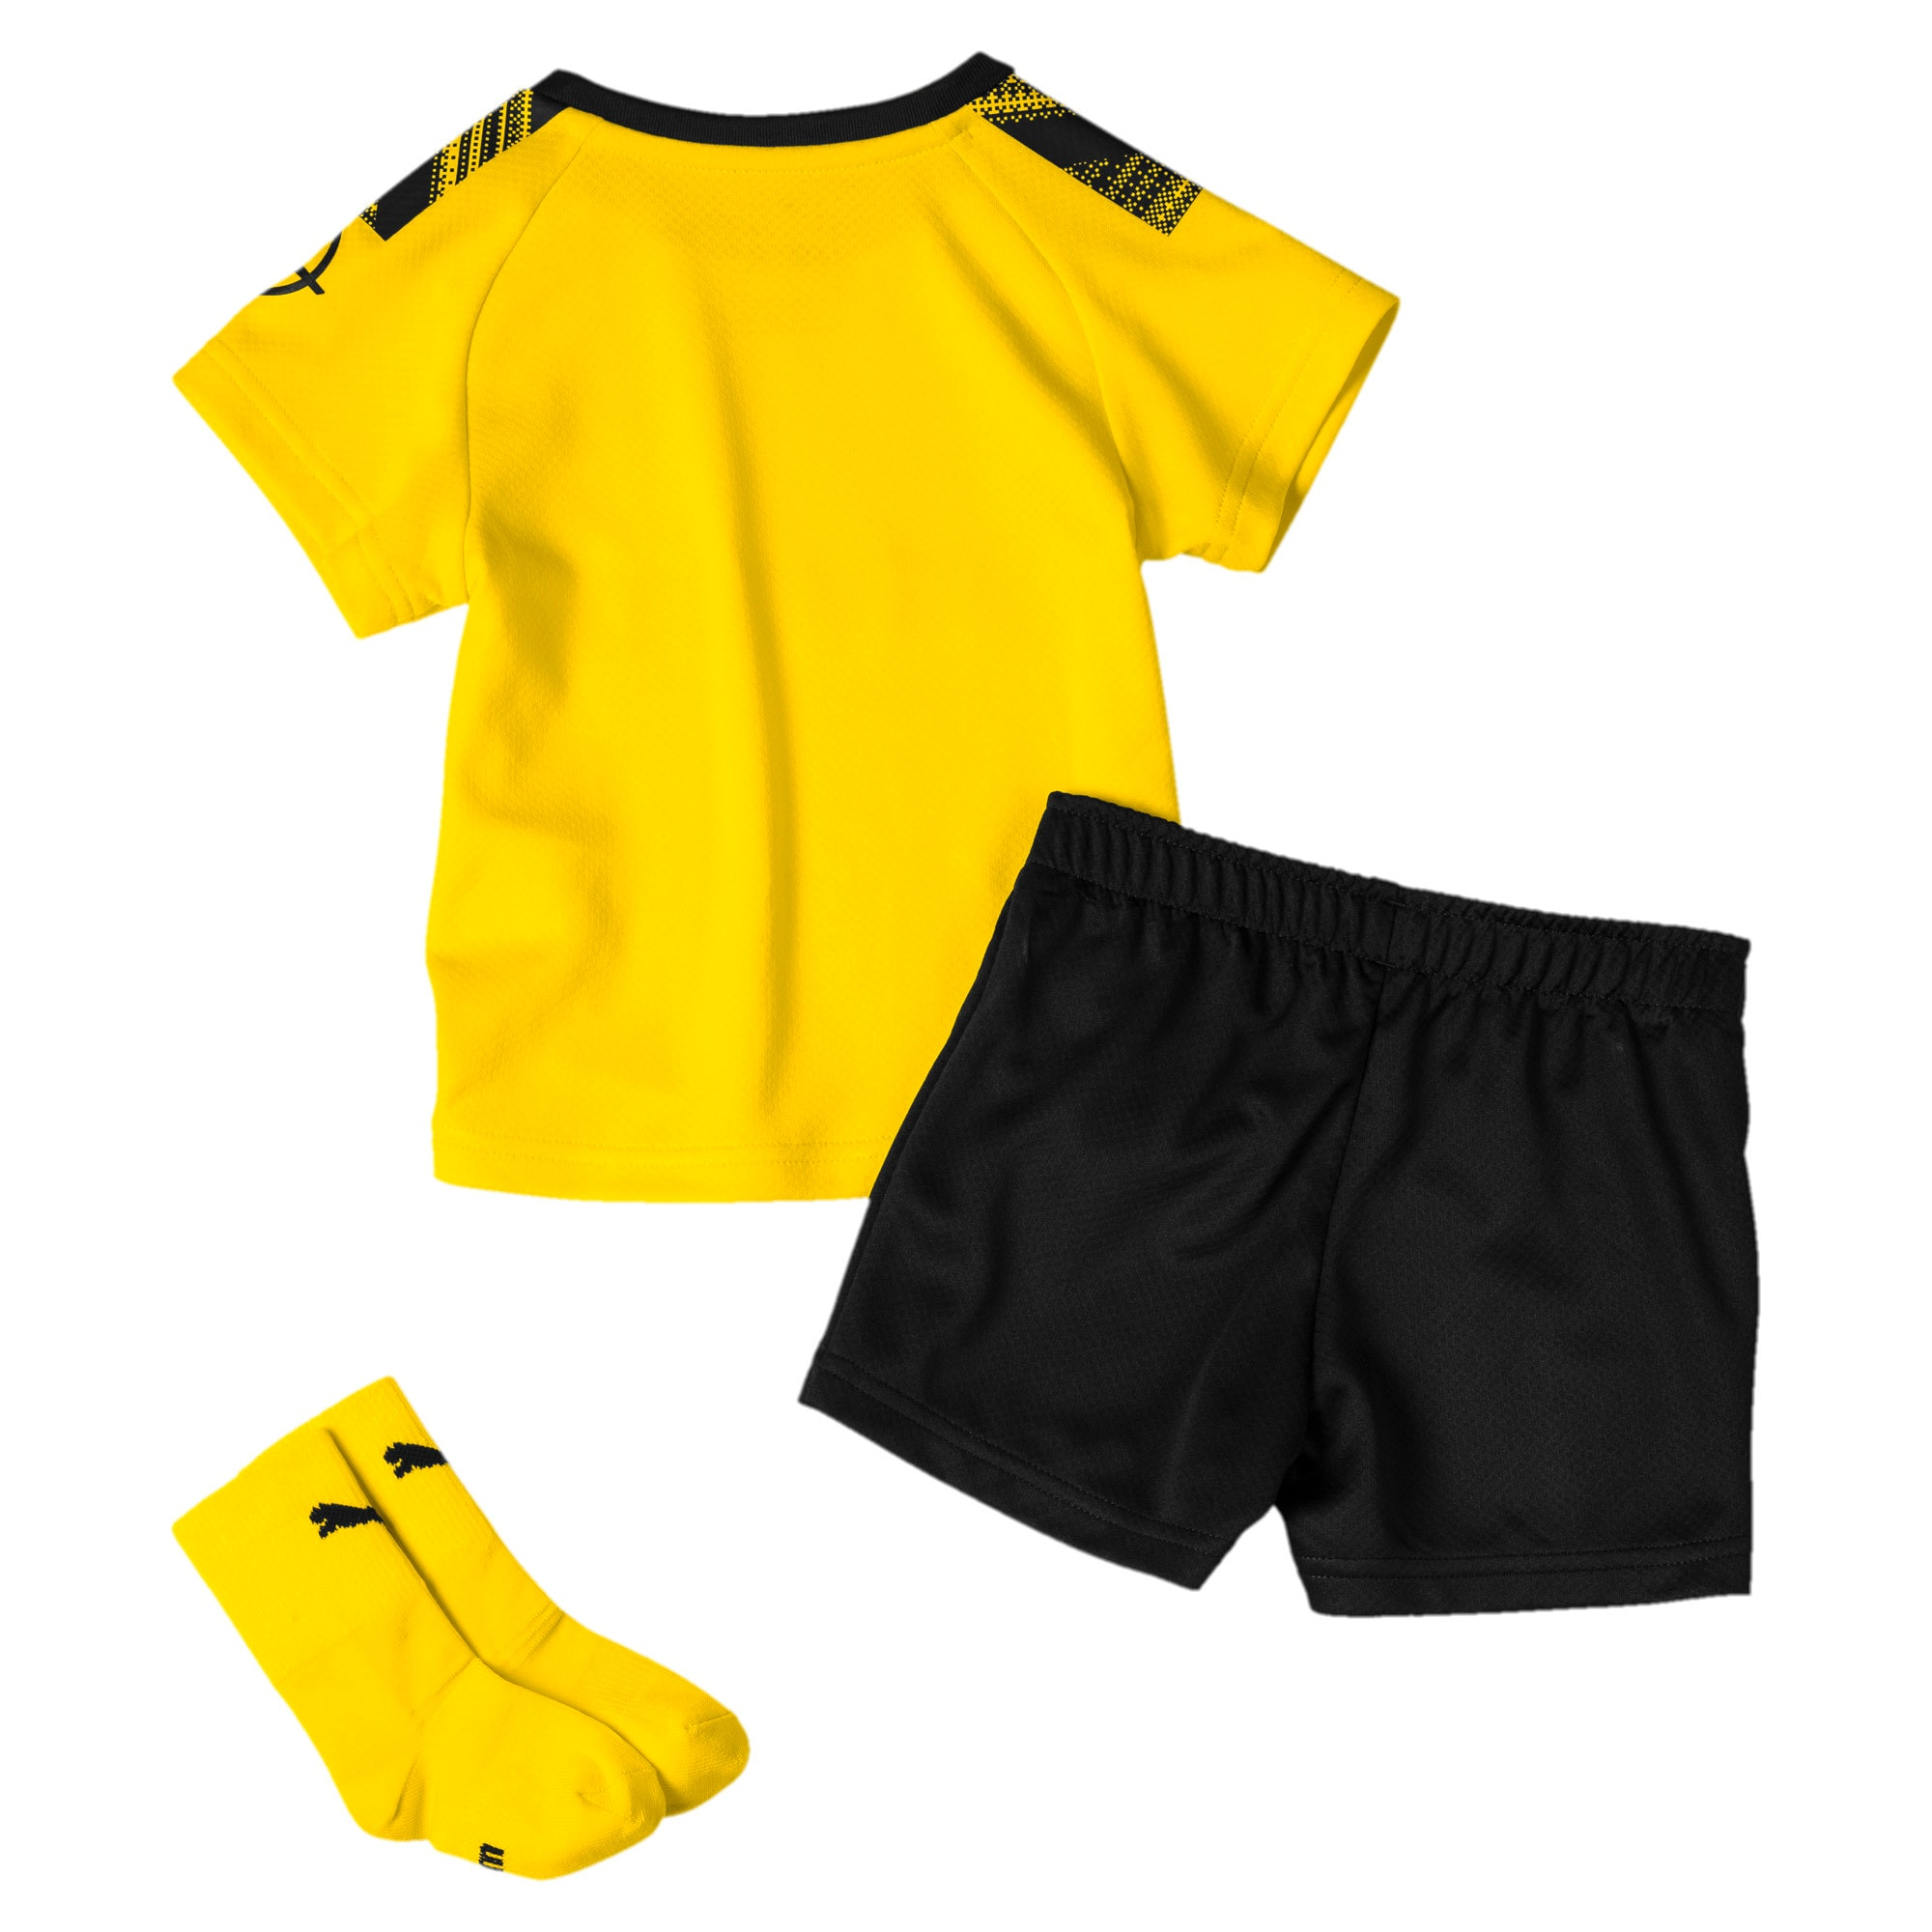 Thumbnail 2 of BVB Babies Heim Mini Set, Cyber Yellow-Puma Black, medium